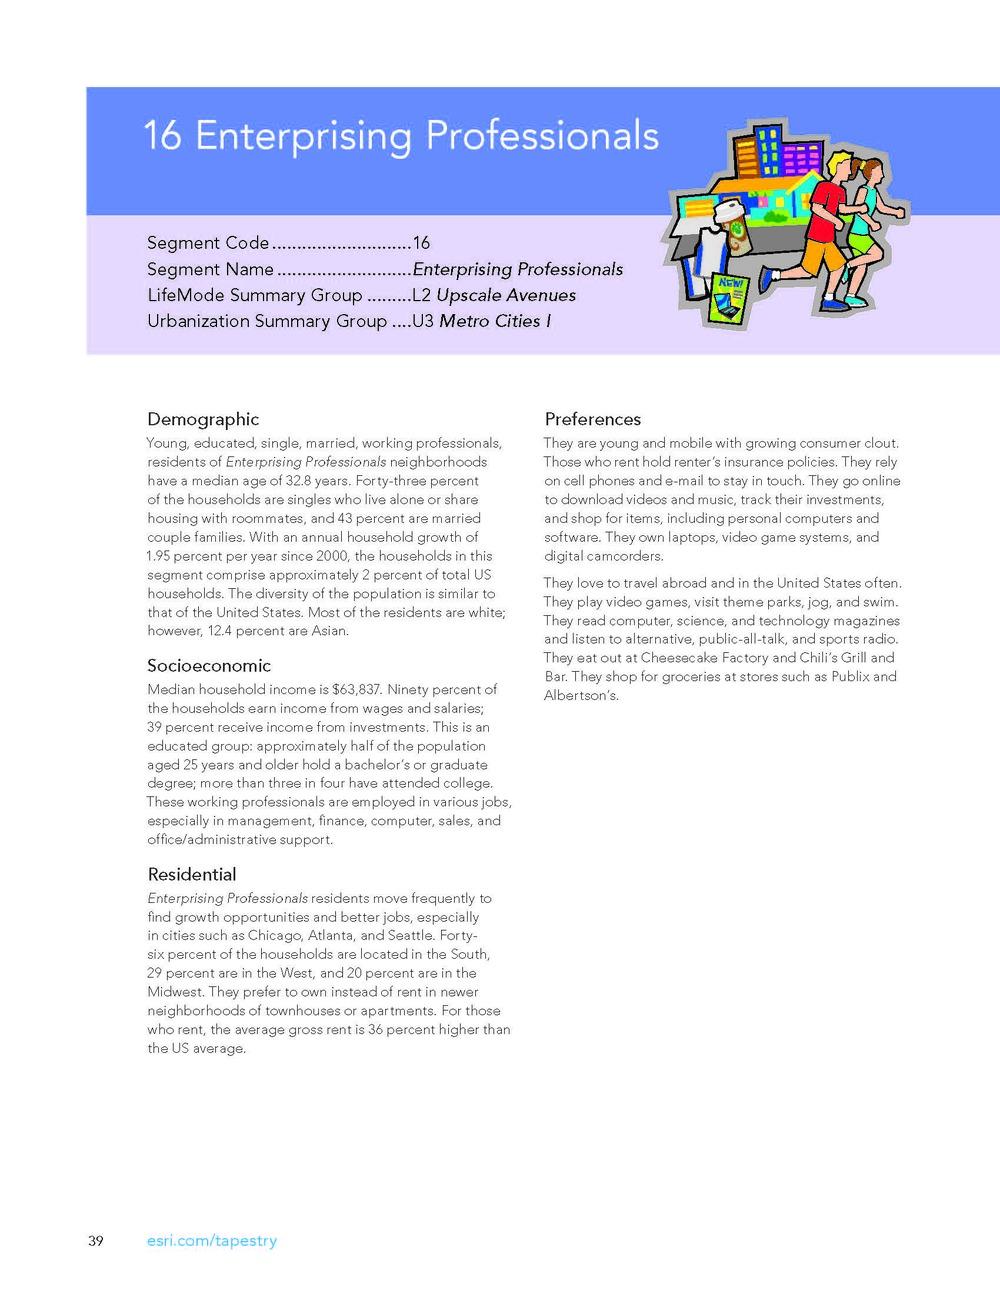 tapestry-segmentation_Page_42.jpg